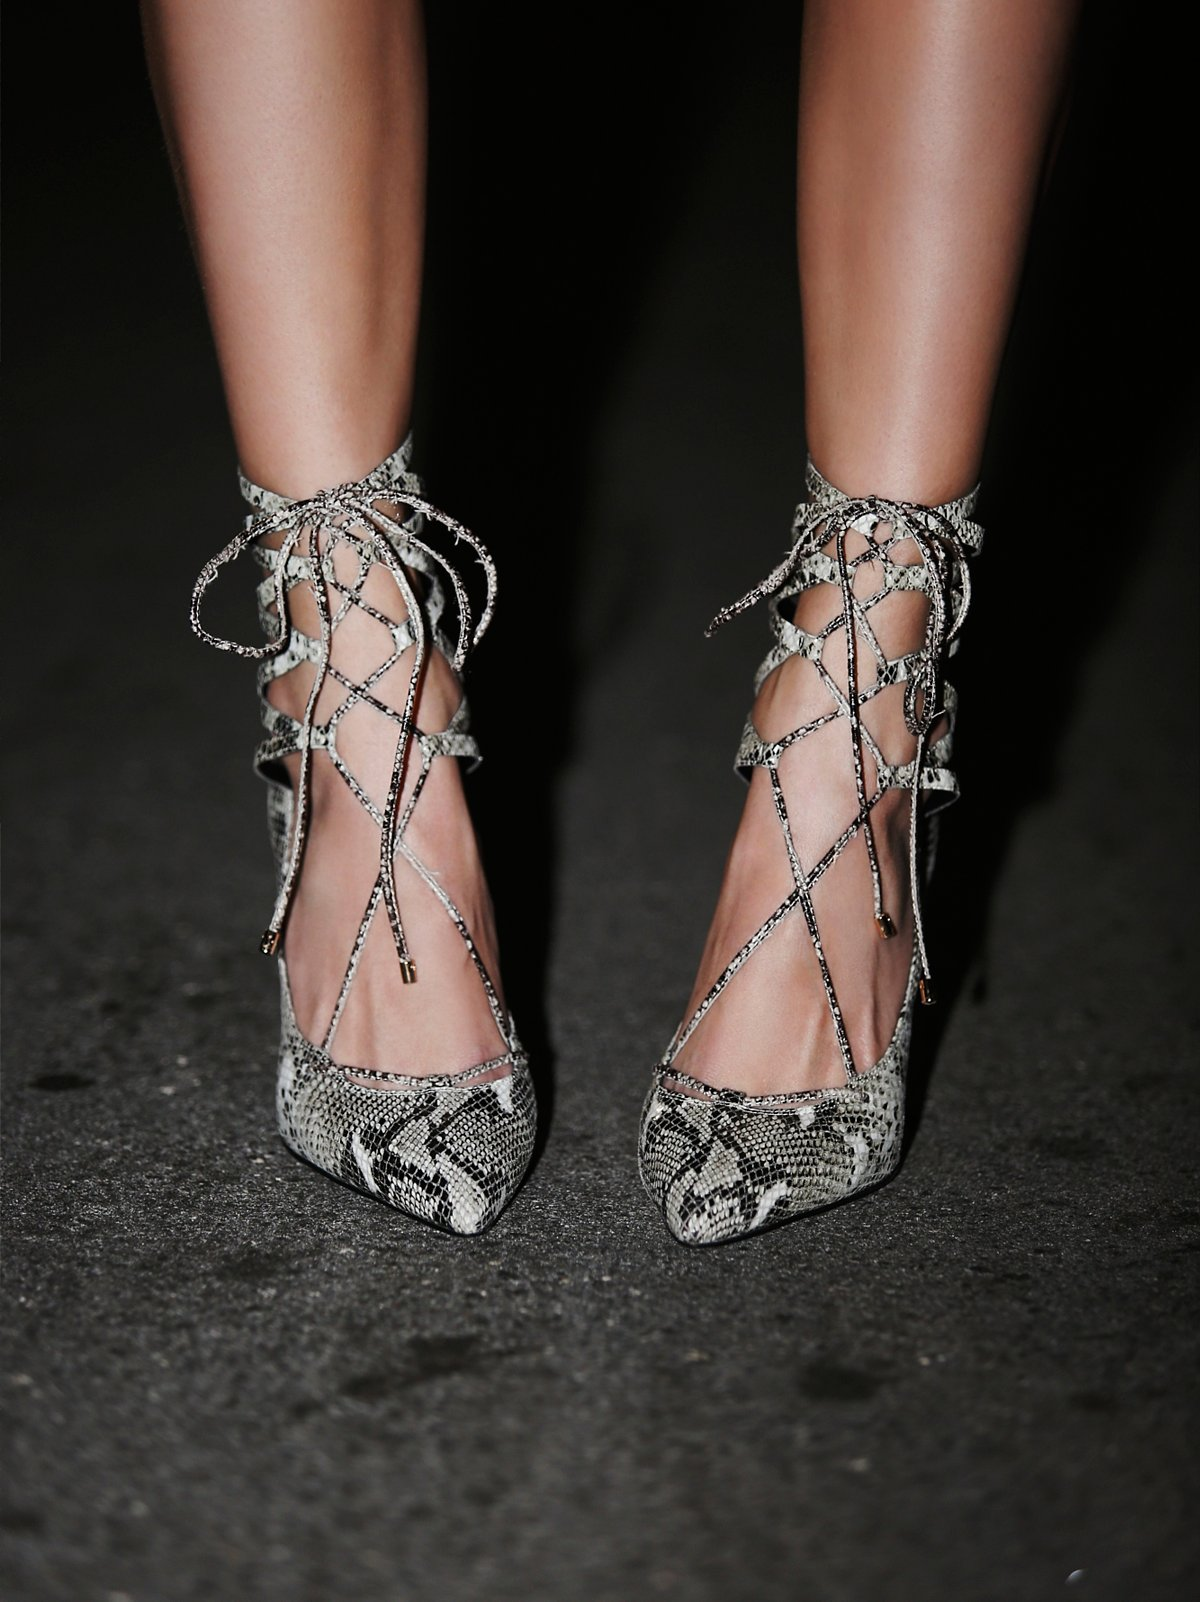 Hierro高跟鞋